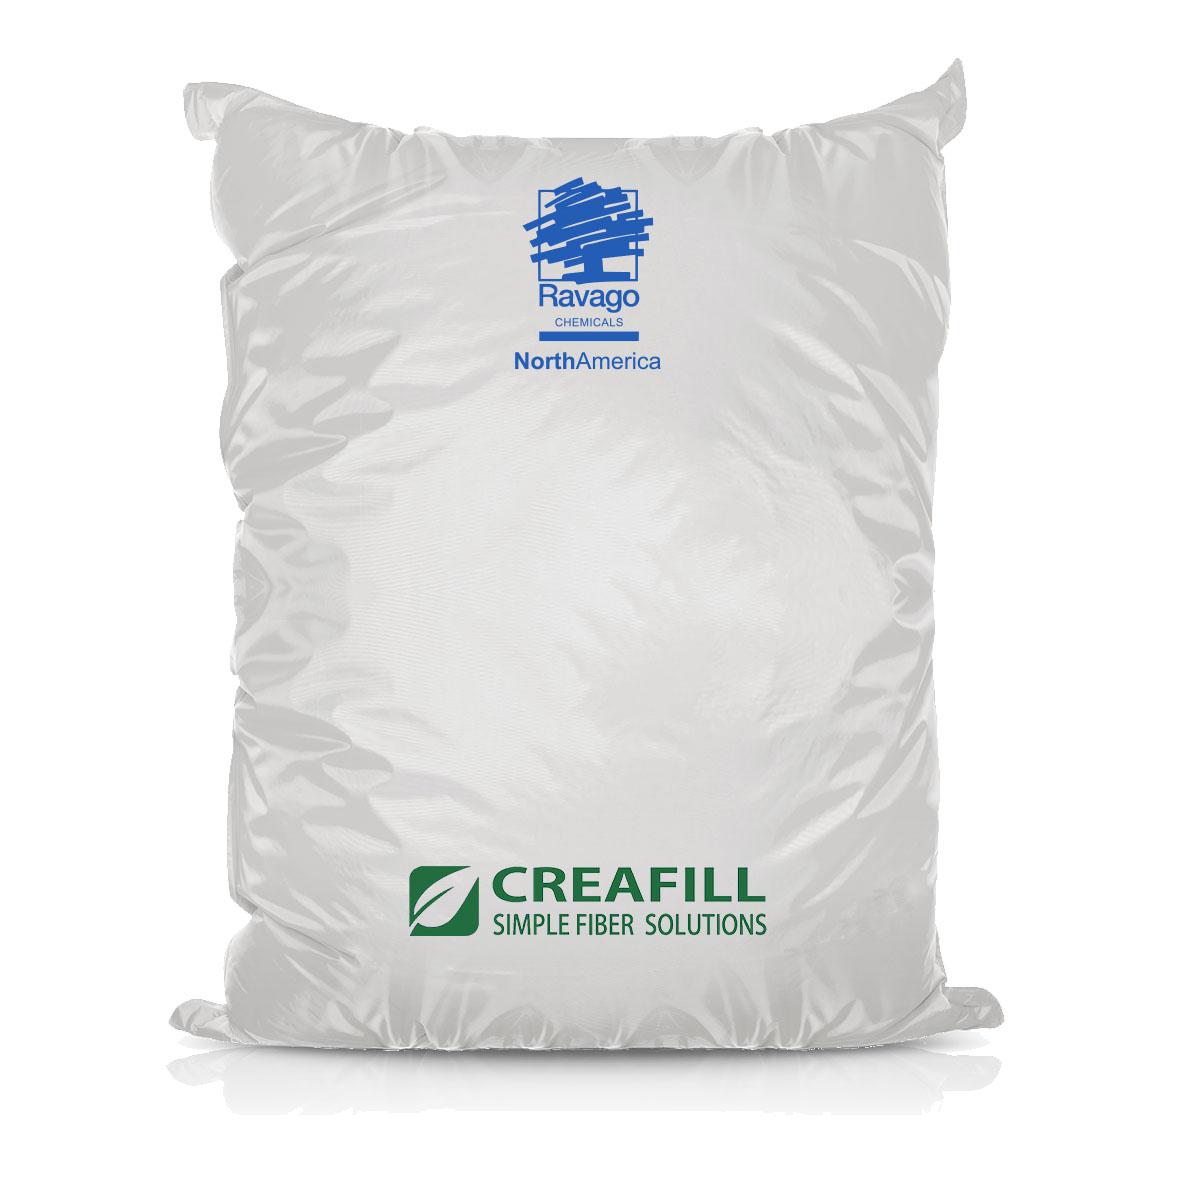 Creaclear Cellulose